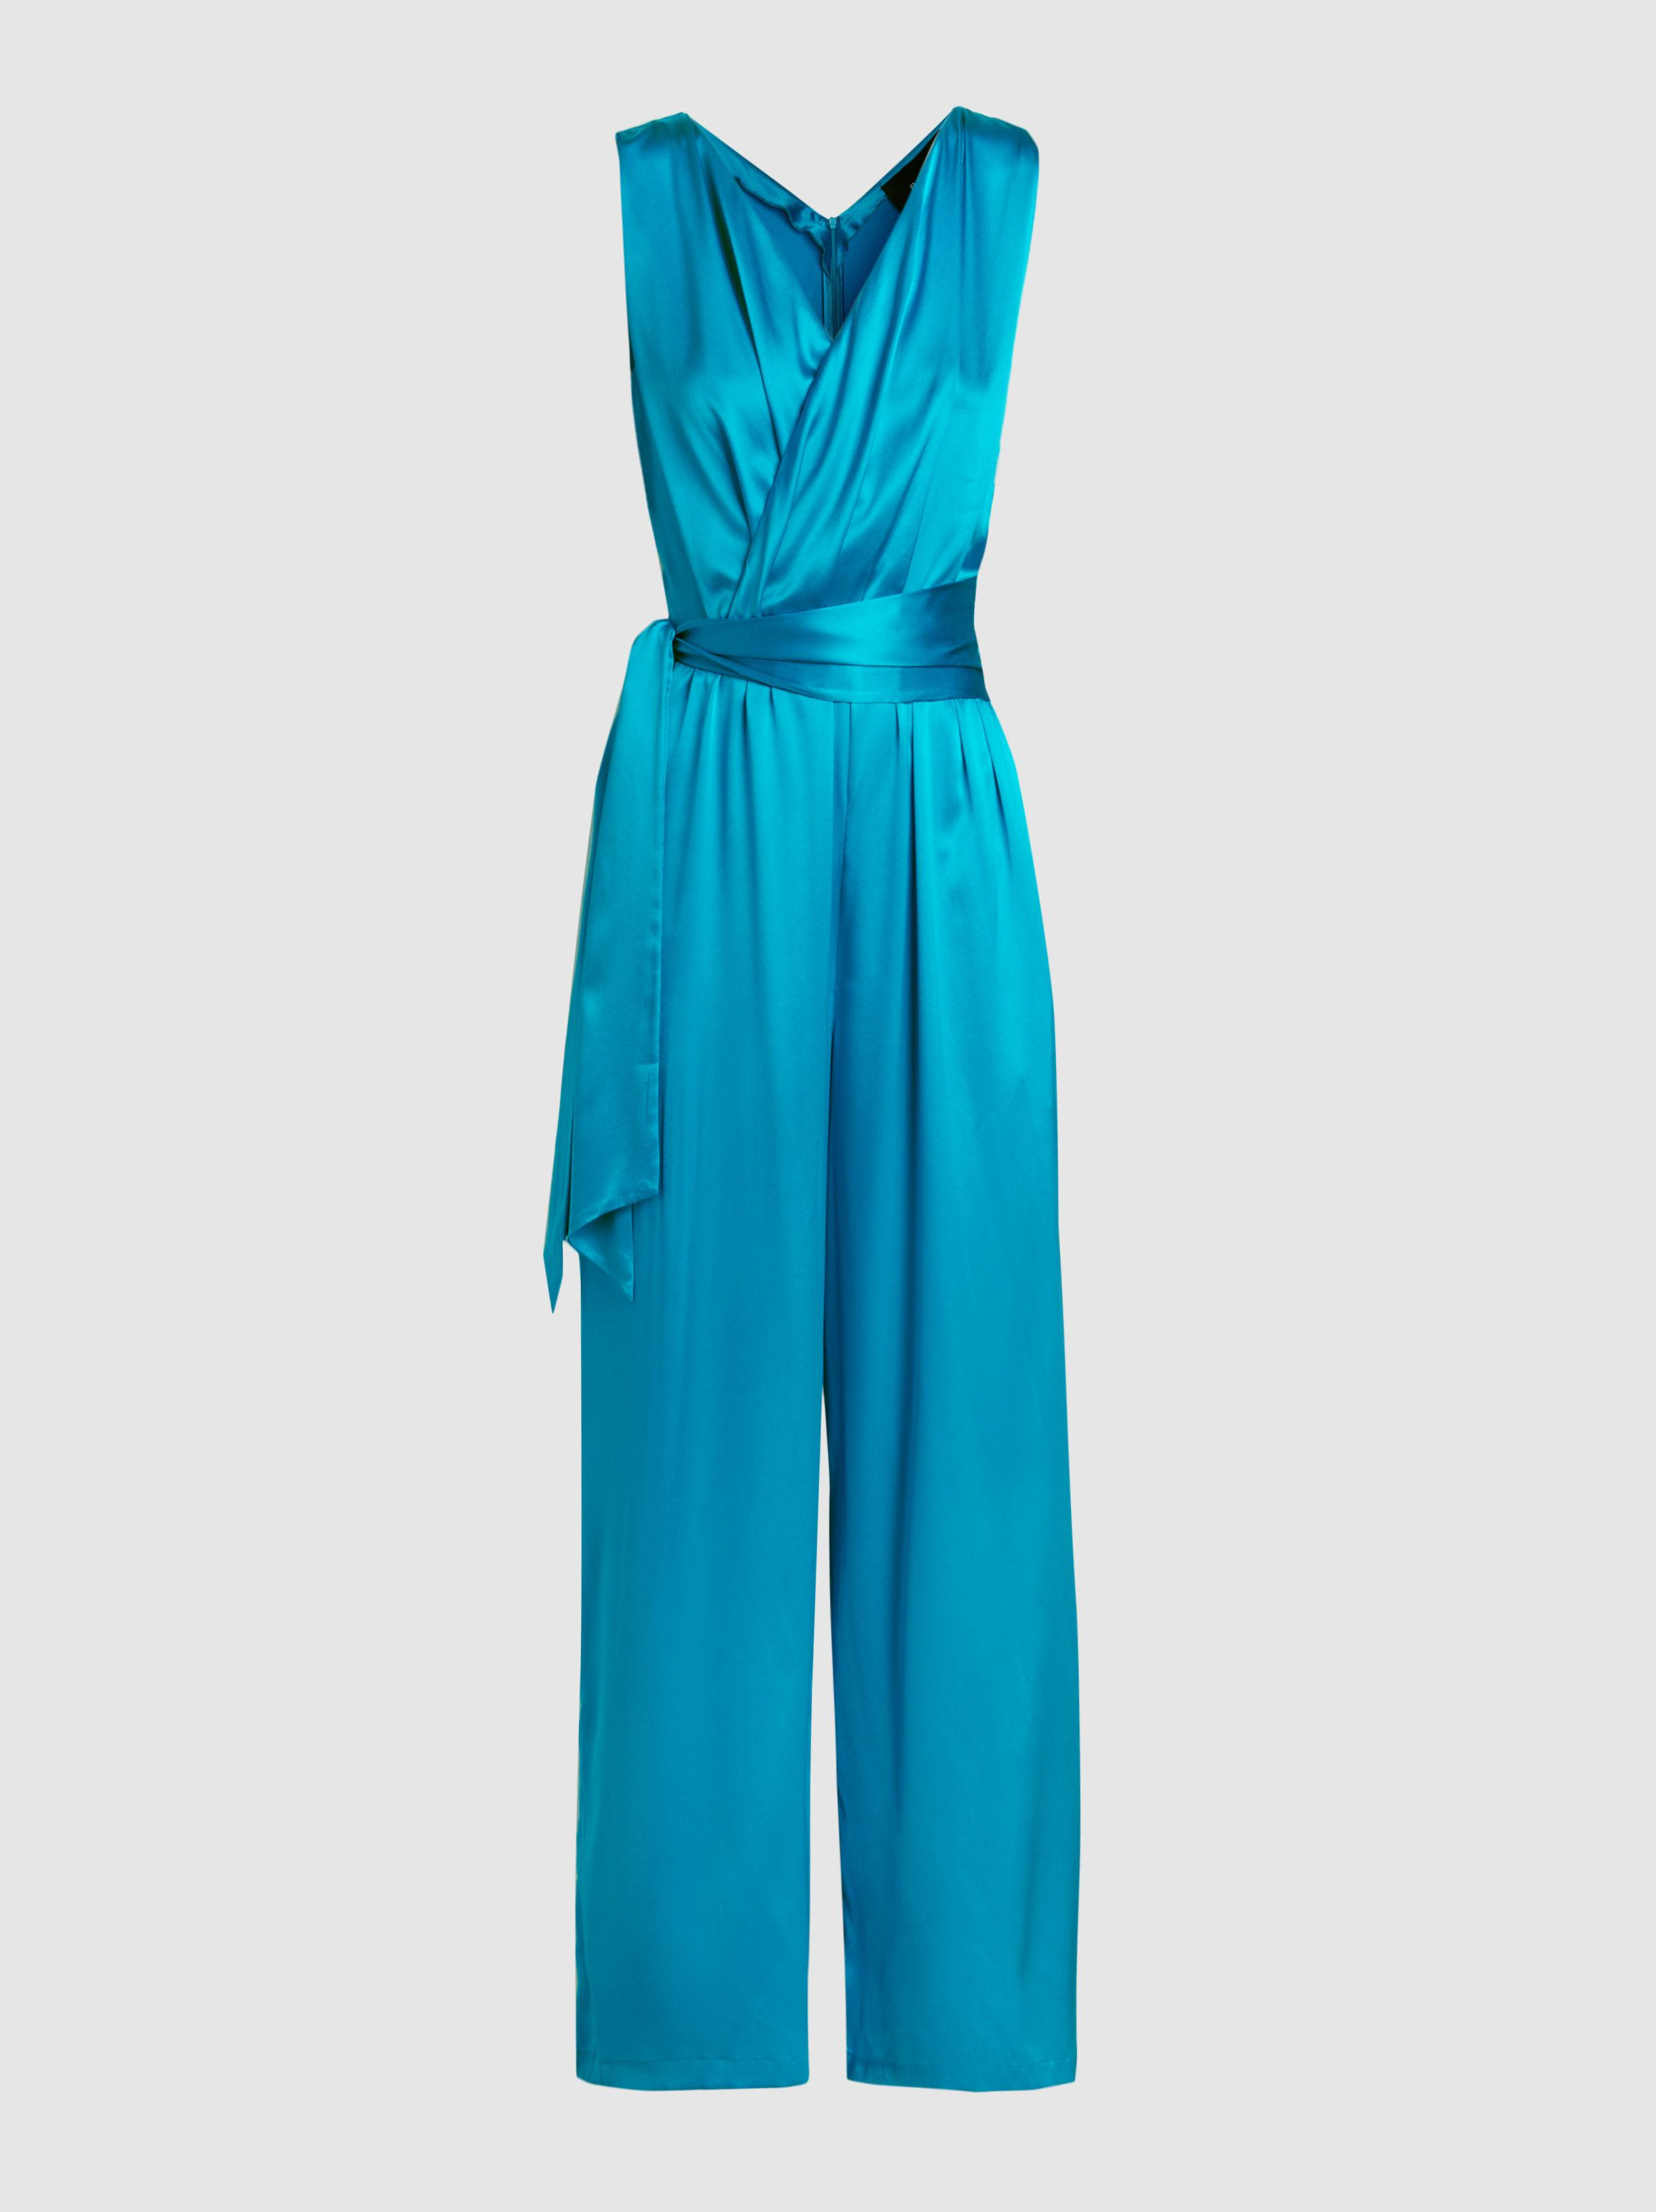 Ebay Discount Amazon Takana Silk-Blend Sleeveless Wrap Jumpsuit Paper London po6JIoDL